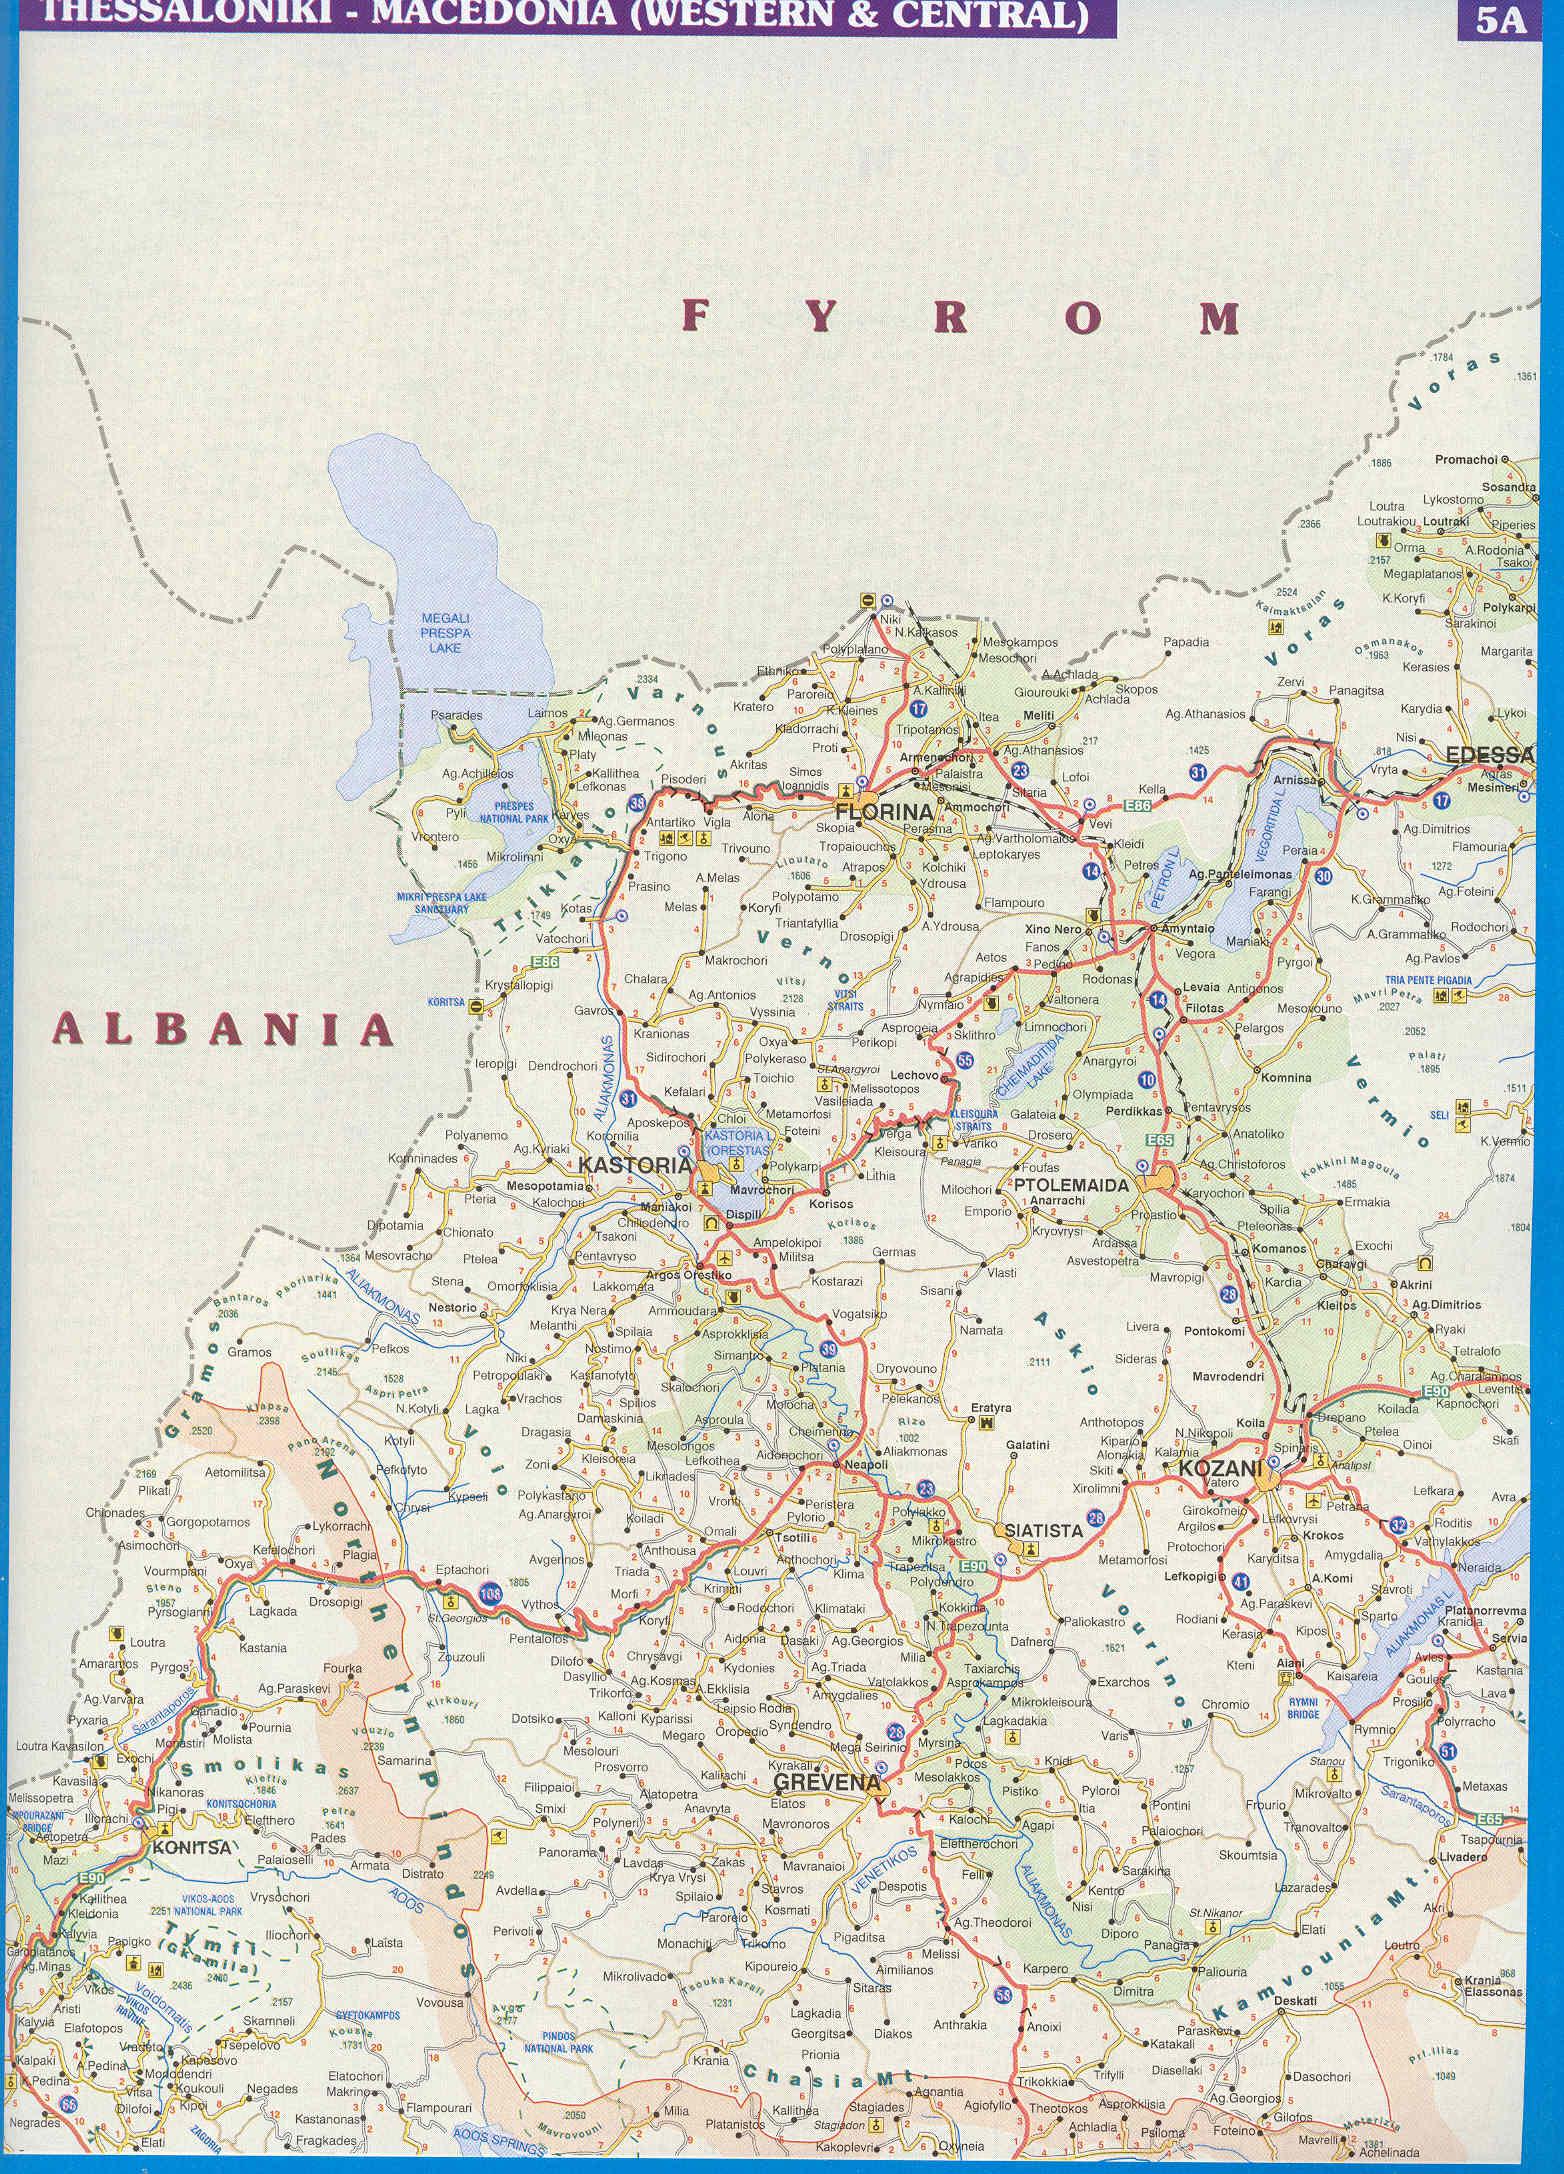 Pella Greece Map.Maps Of Greece